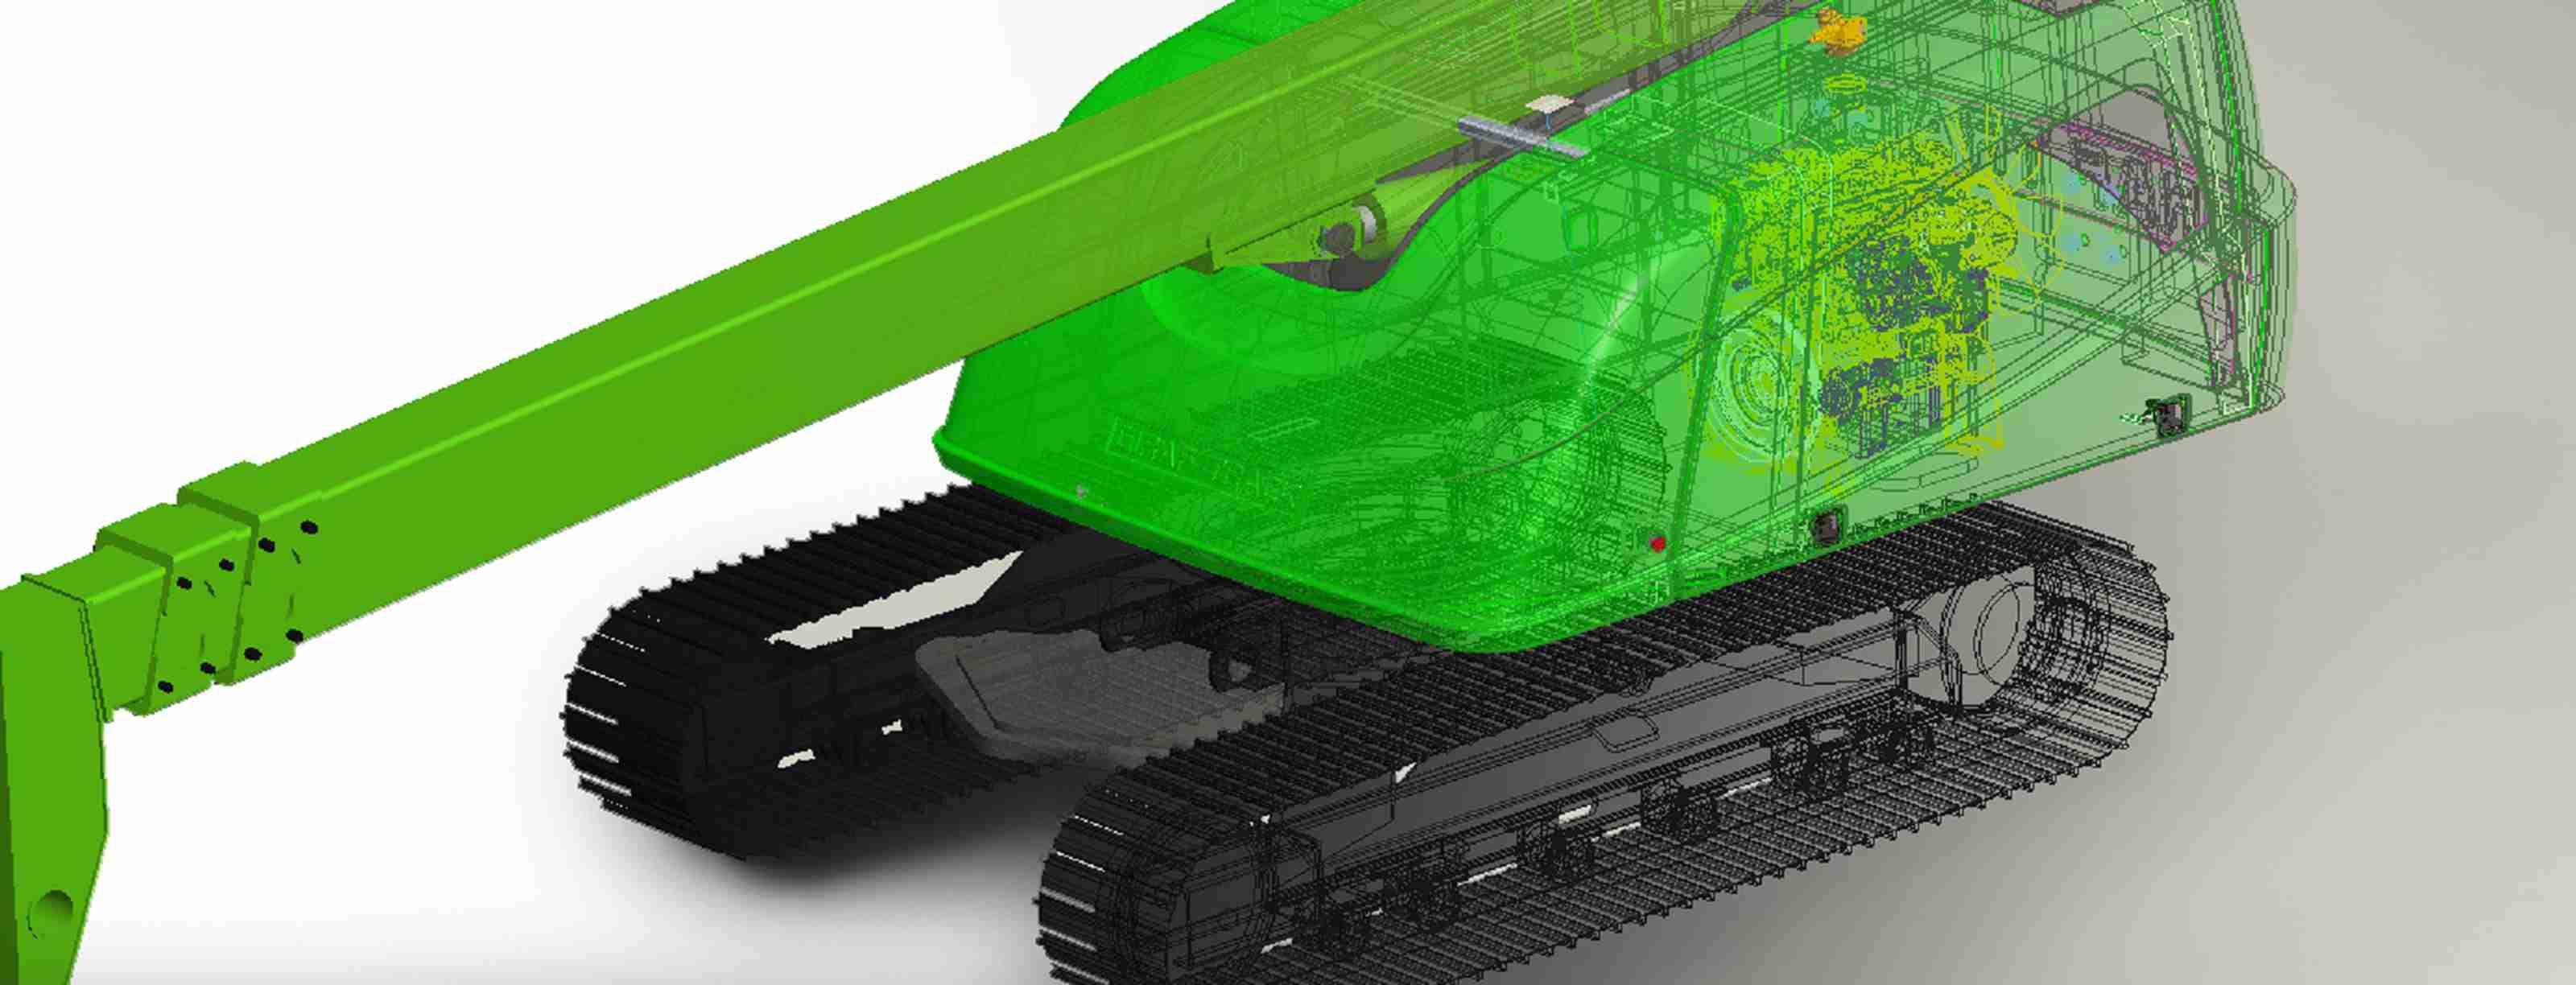 3D cad ontwikkelingen, prototyping & styling